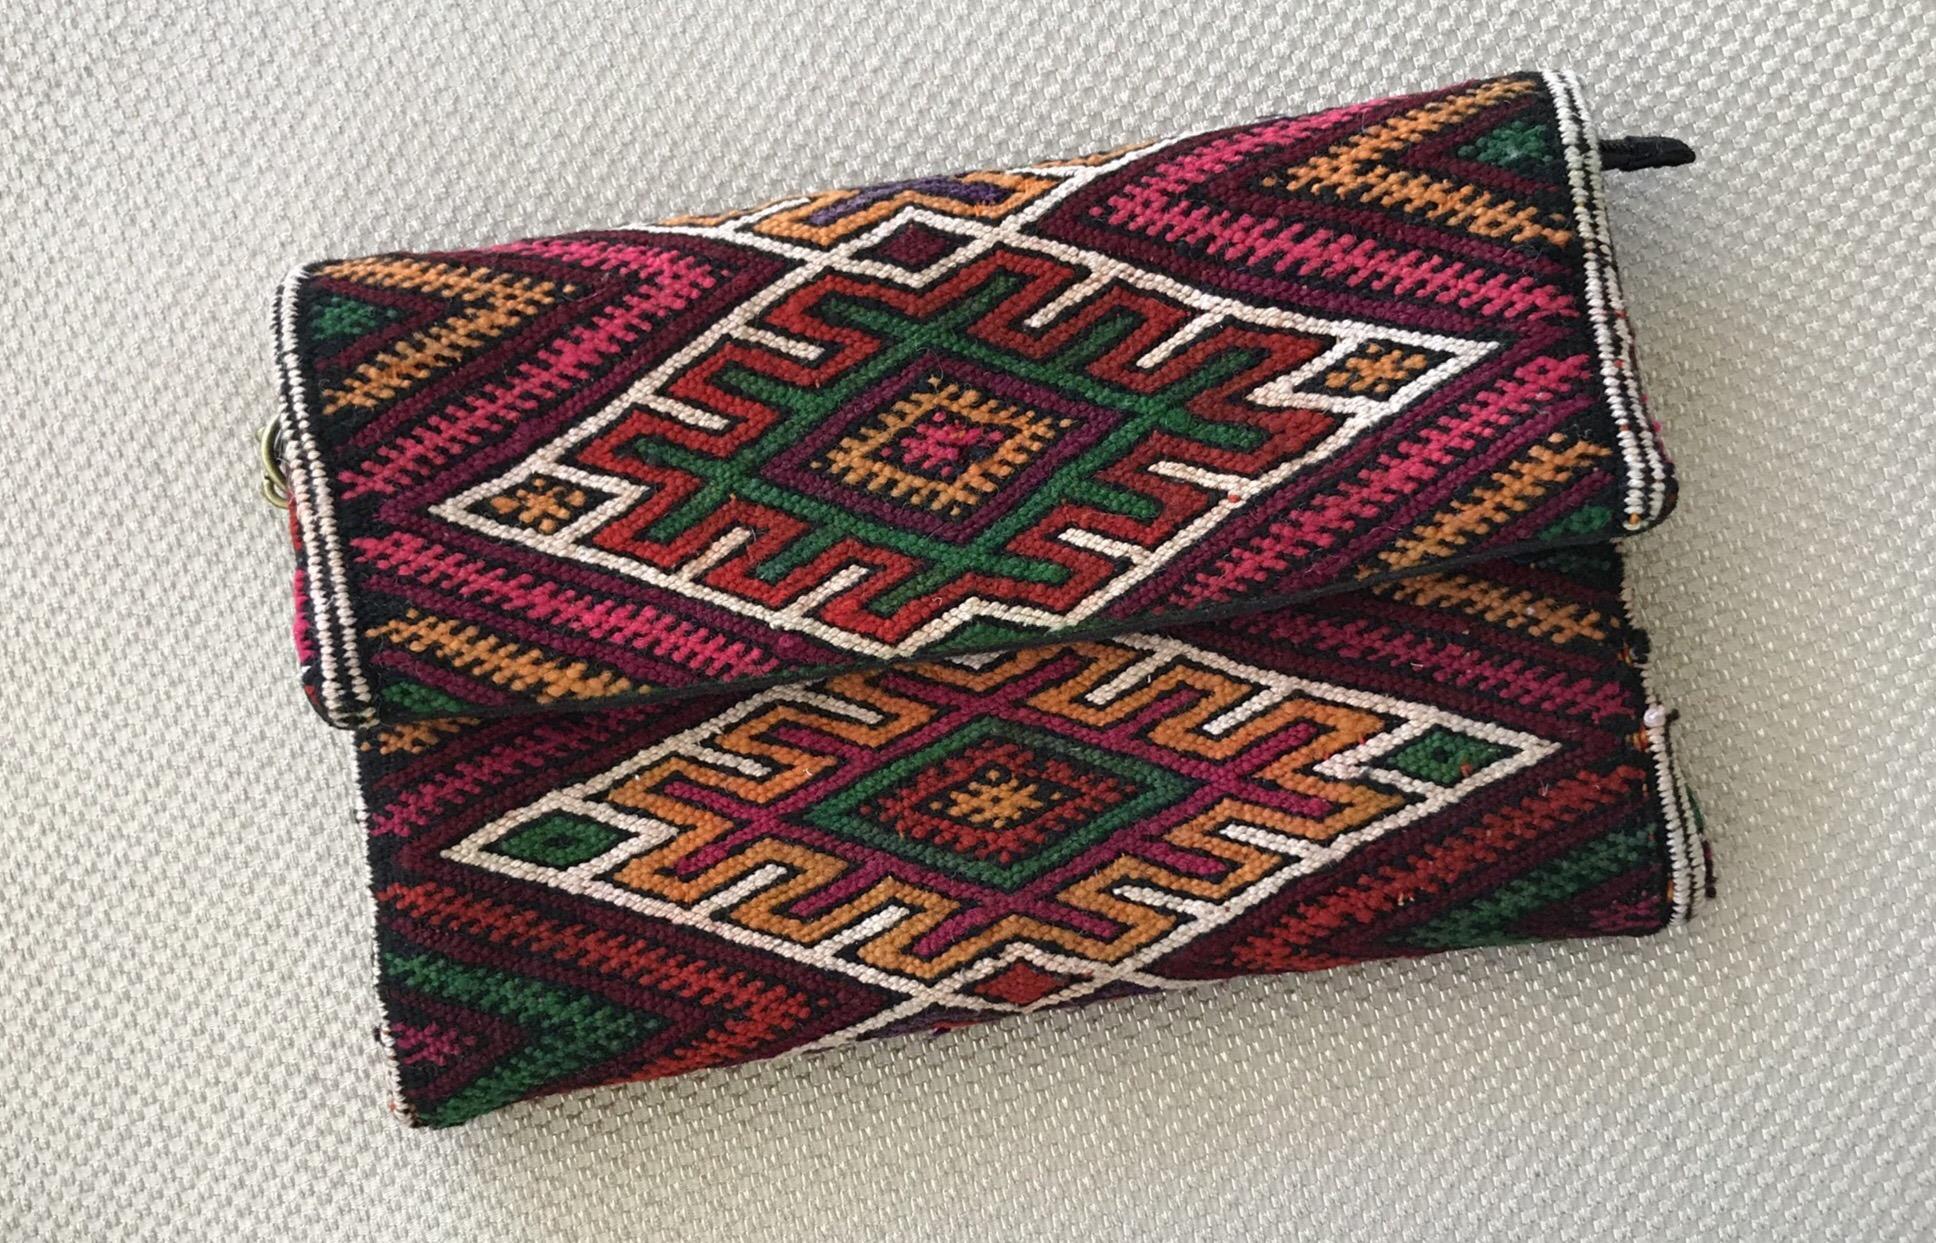 Rug Bag vintage kilim colorful